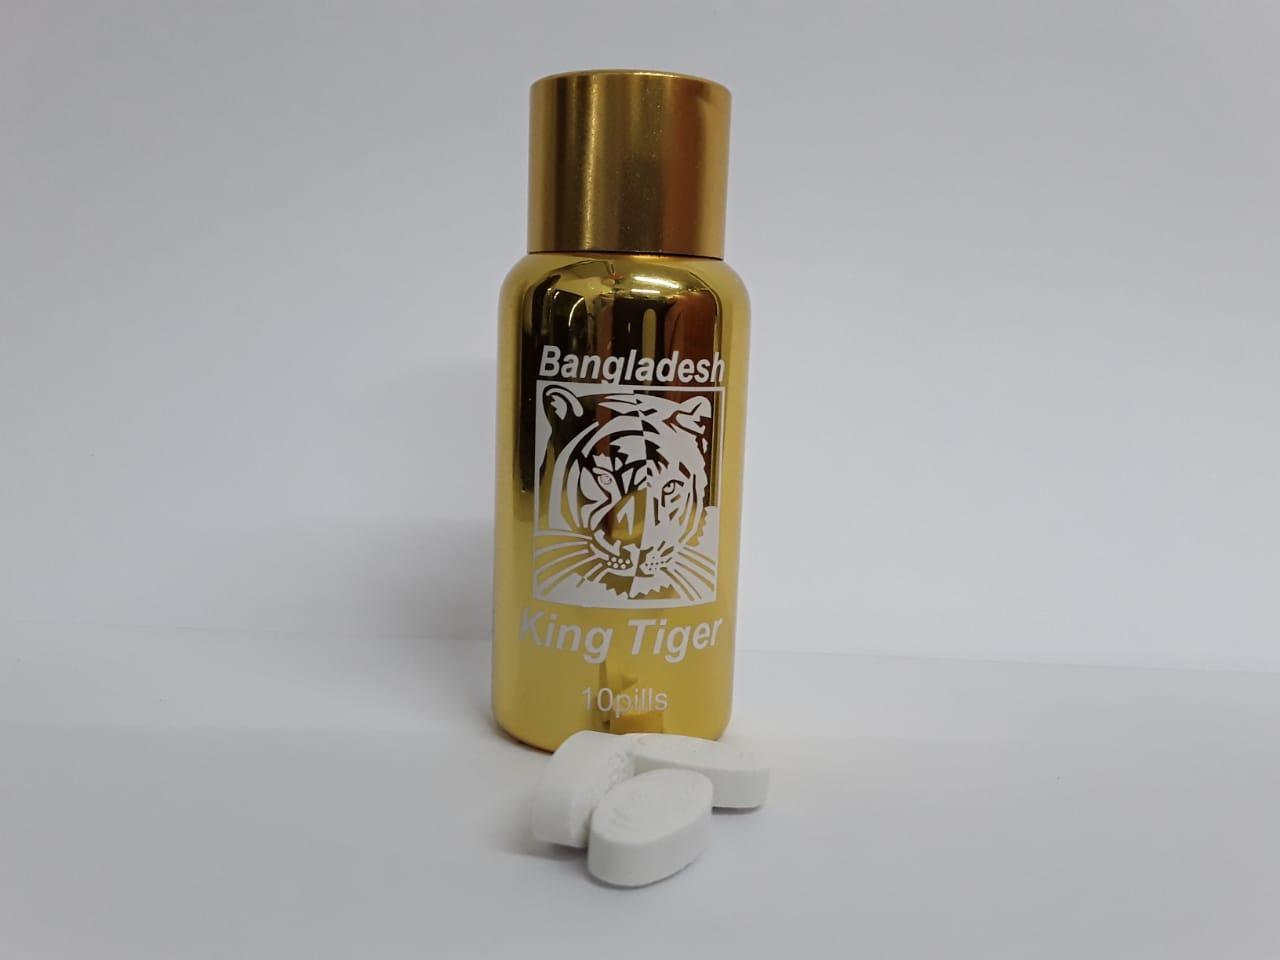 Bangladesh King Tiger Бенгальский тигр средство для повышения потенции, флакон 10 таблеток